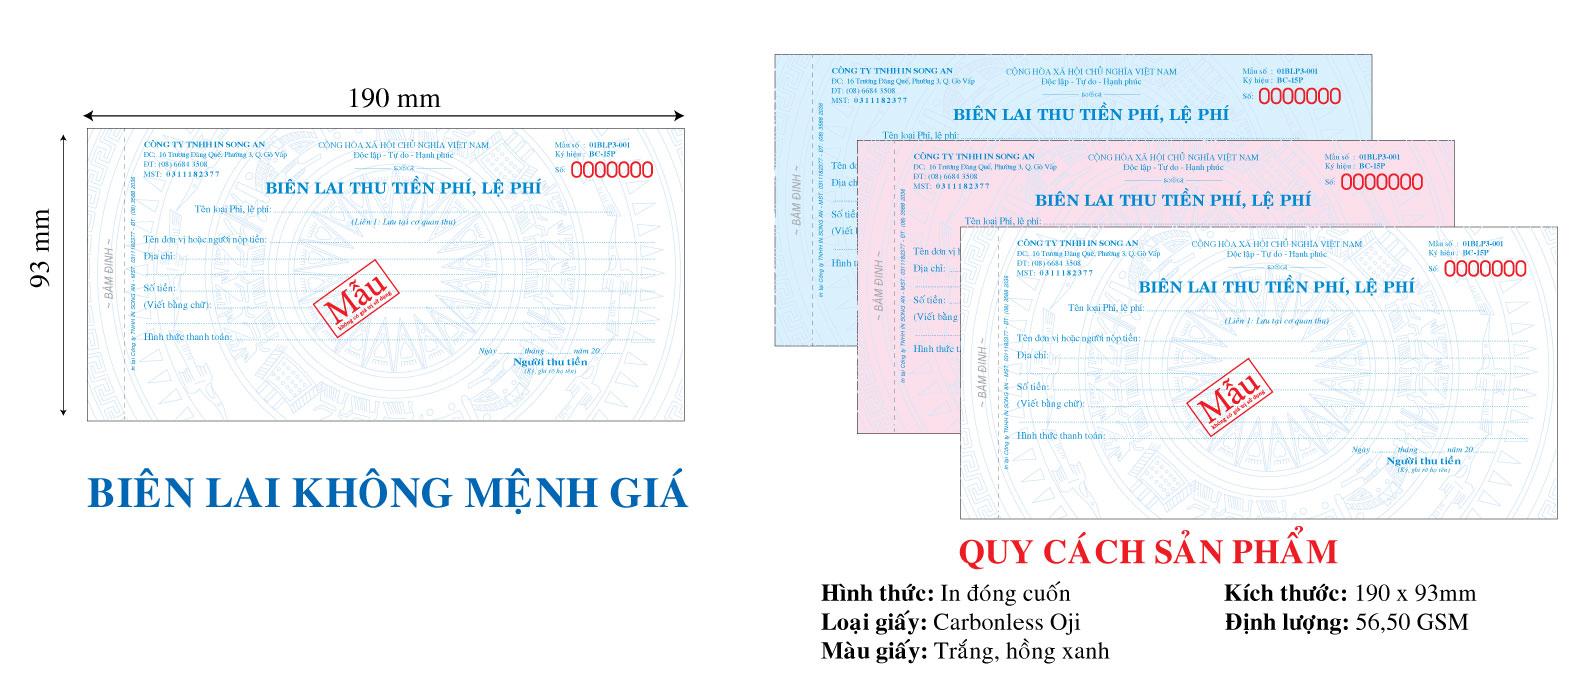 Bien-lai-khong-menh-gia-190x93-(1)